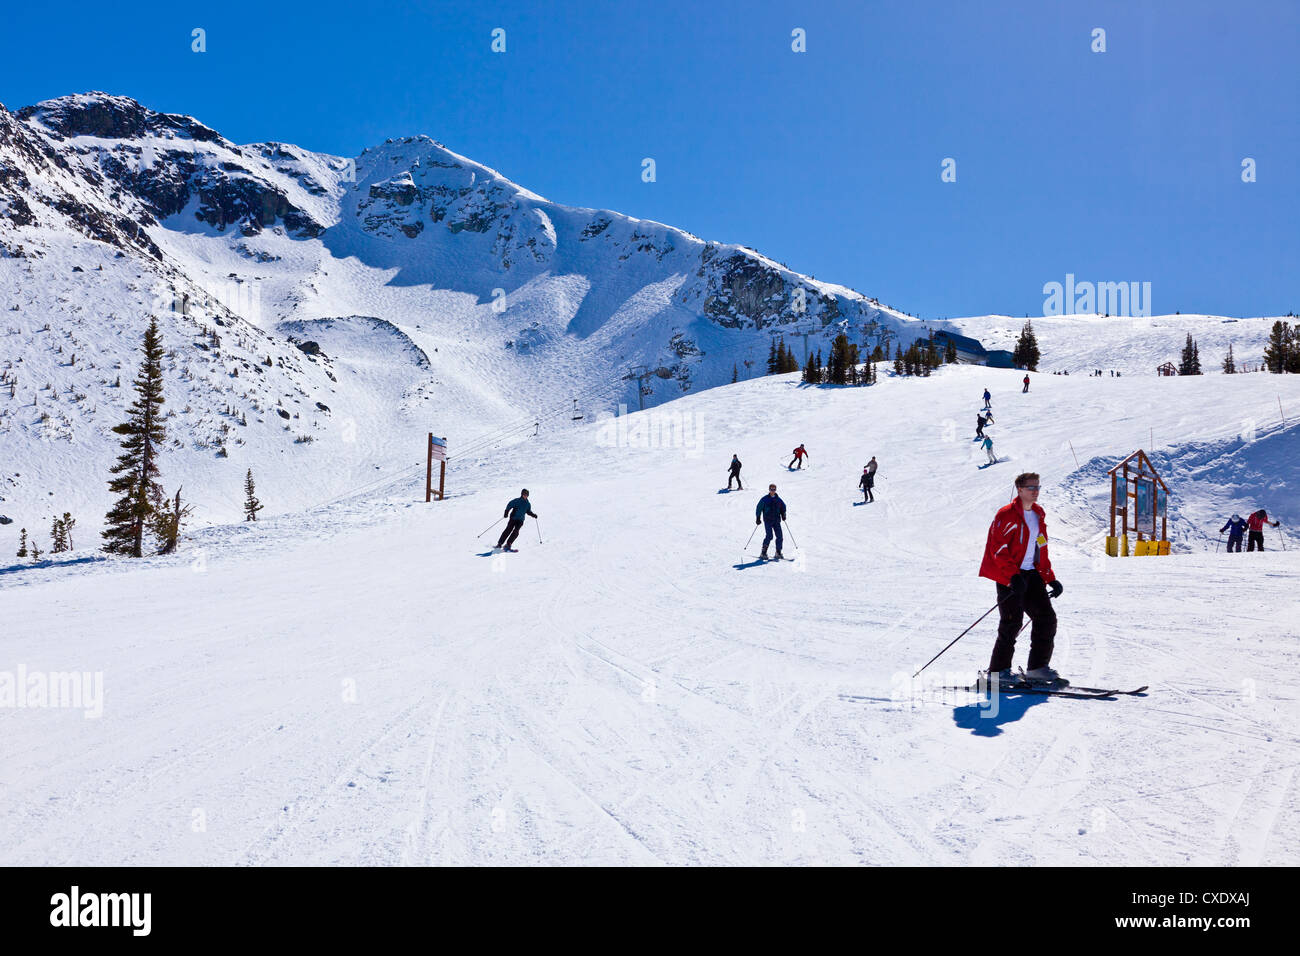 whistler blackcomb ski resort, whistler, british columbia, canada